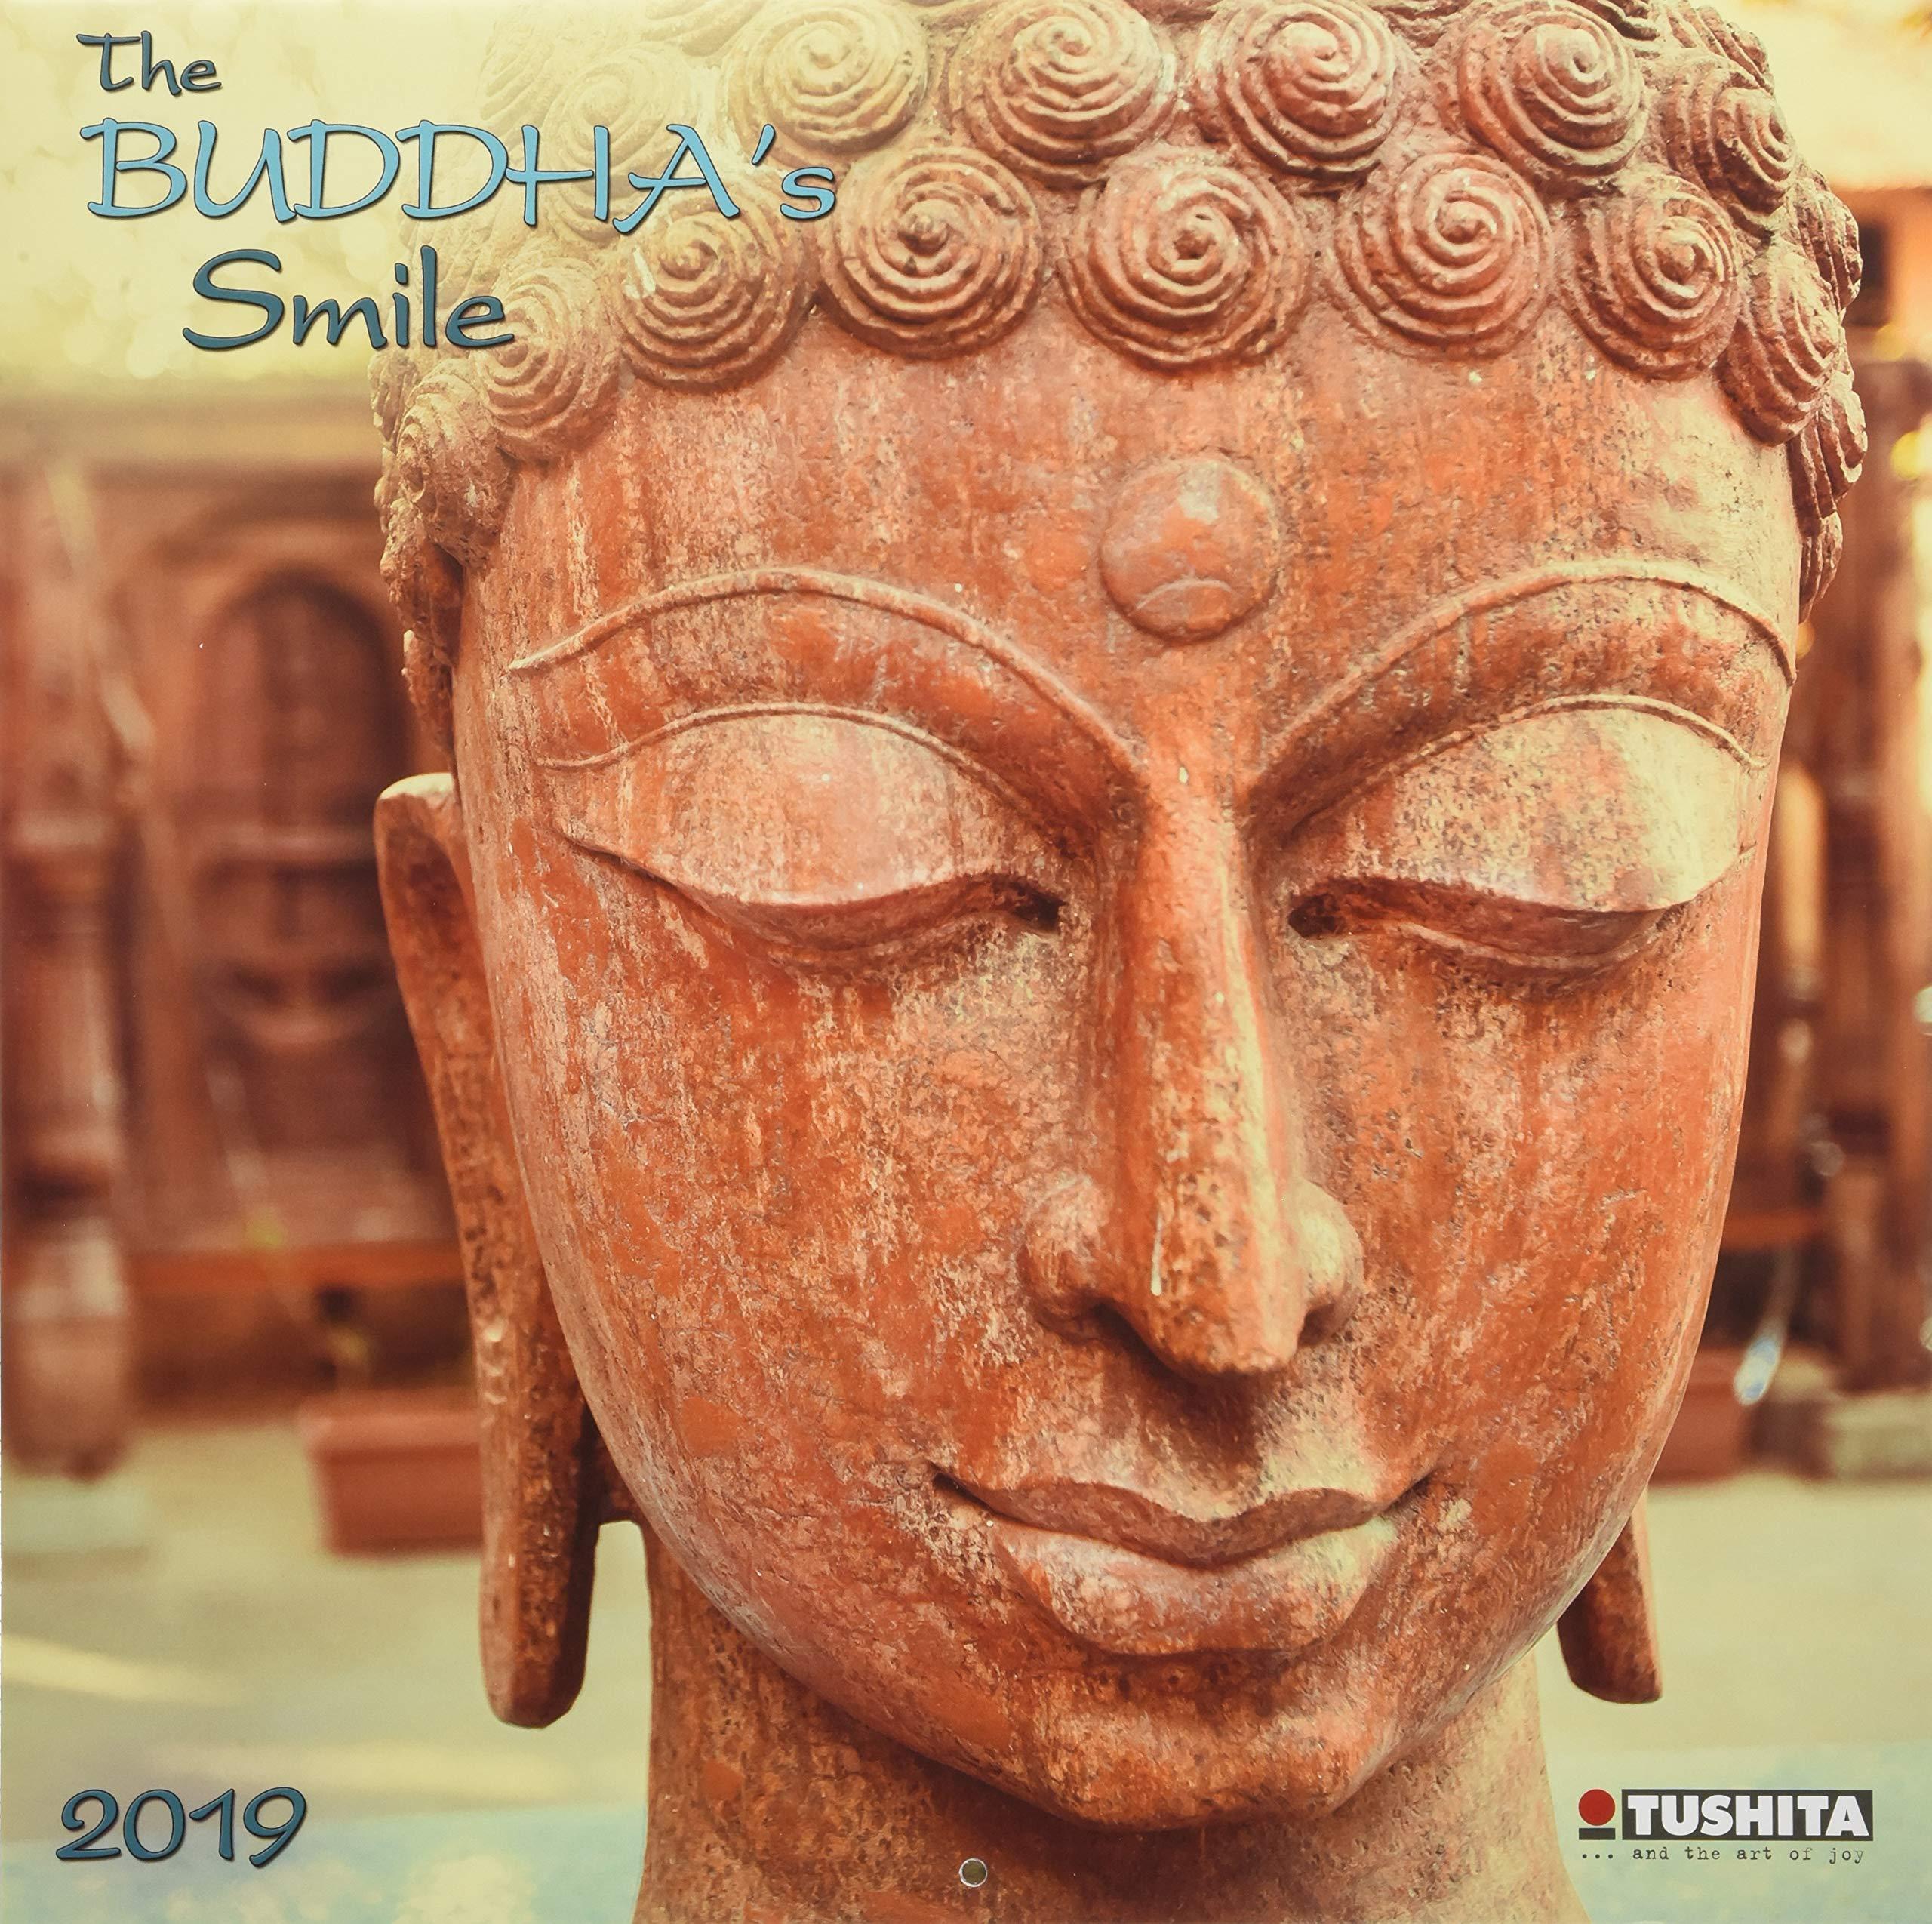 The Buddha's Smile 2019  Kalender 2019  Mindful Edition